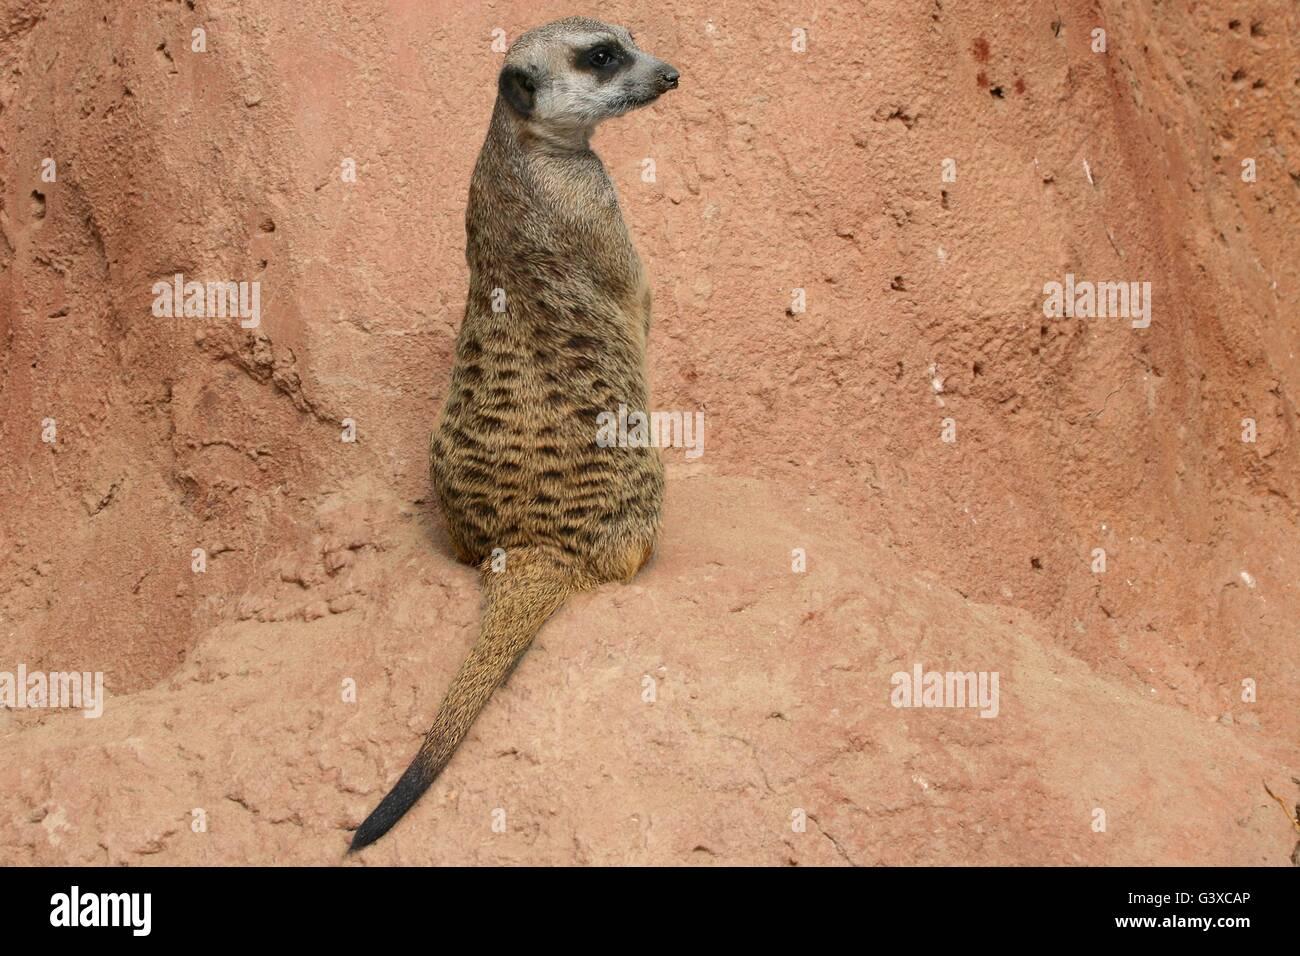 Meerkat stood staring - Stock Image